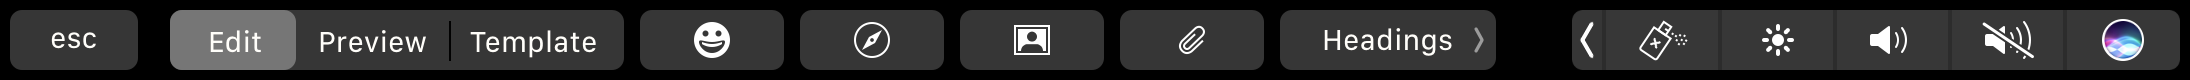 HTML Editor Touch Bar